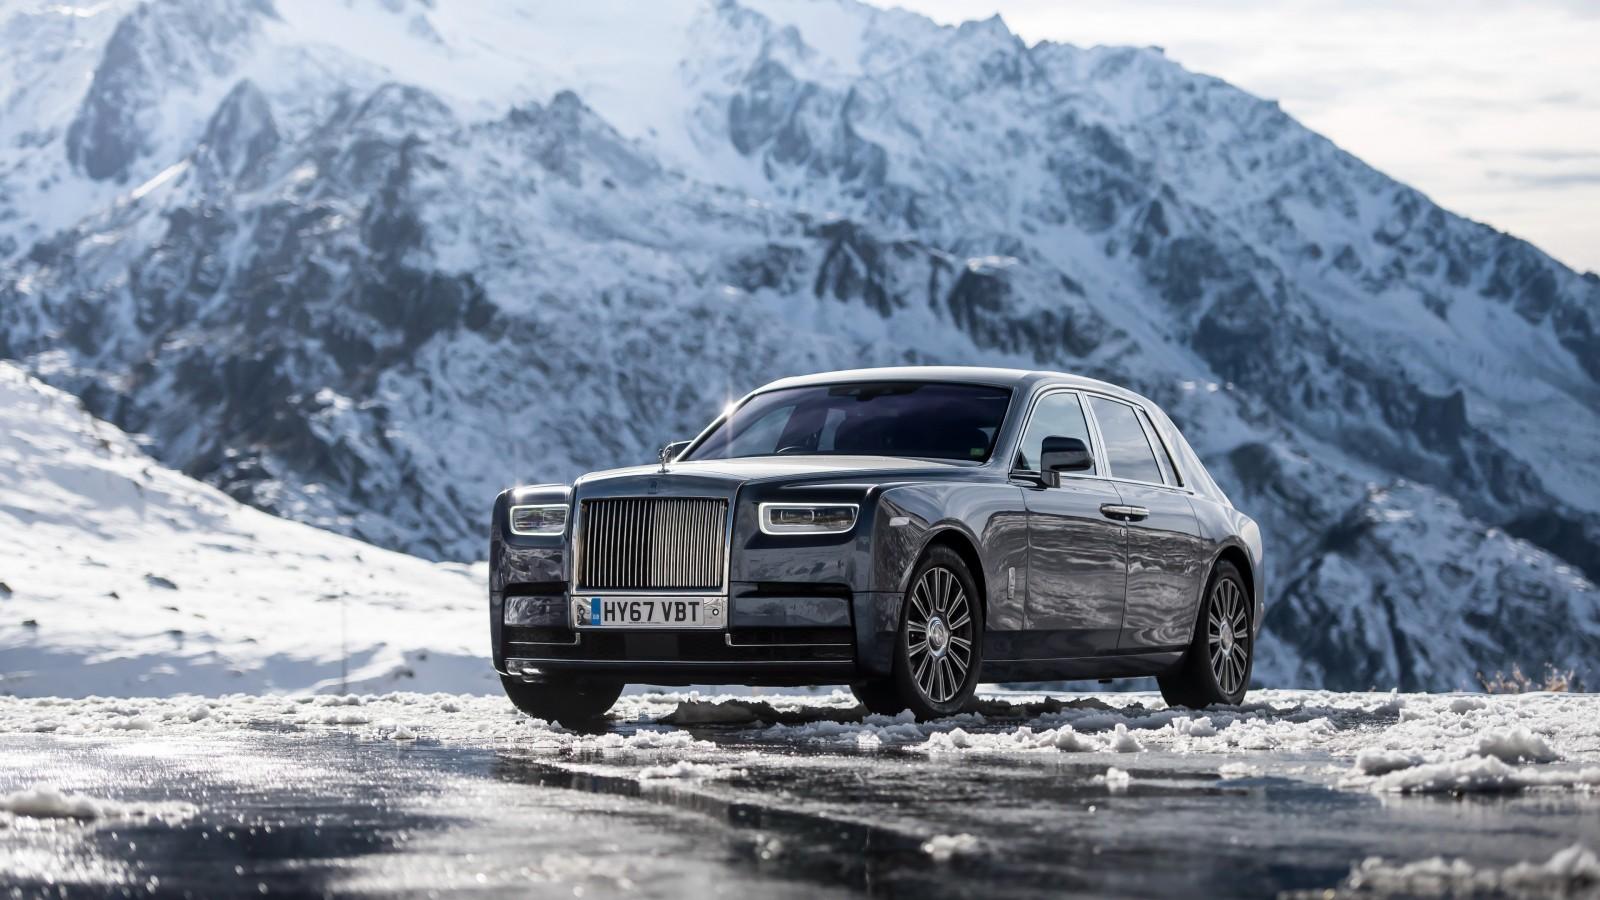 Mobile Car Wash Wallpaper Rolls Royce Phantom 2017 4k 2 Wallpapers Hd Wallpapers